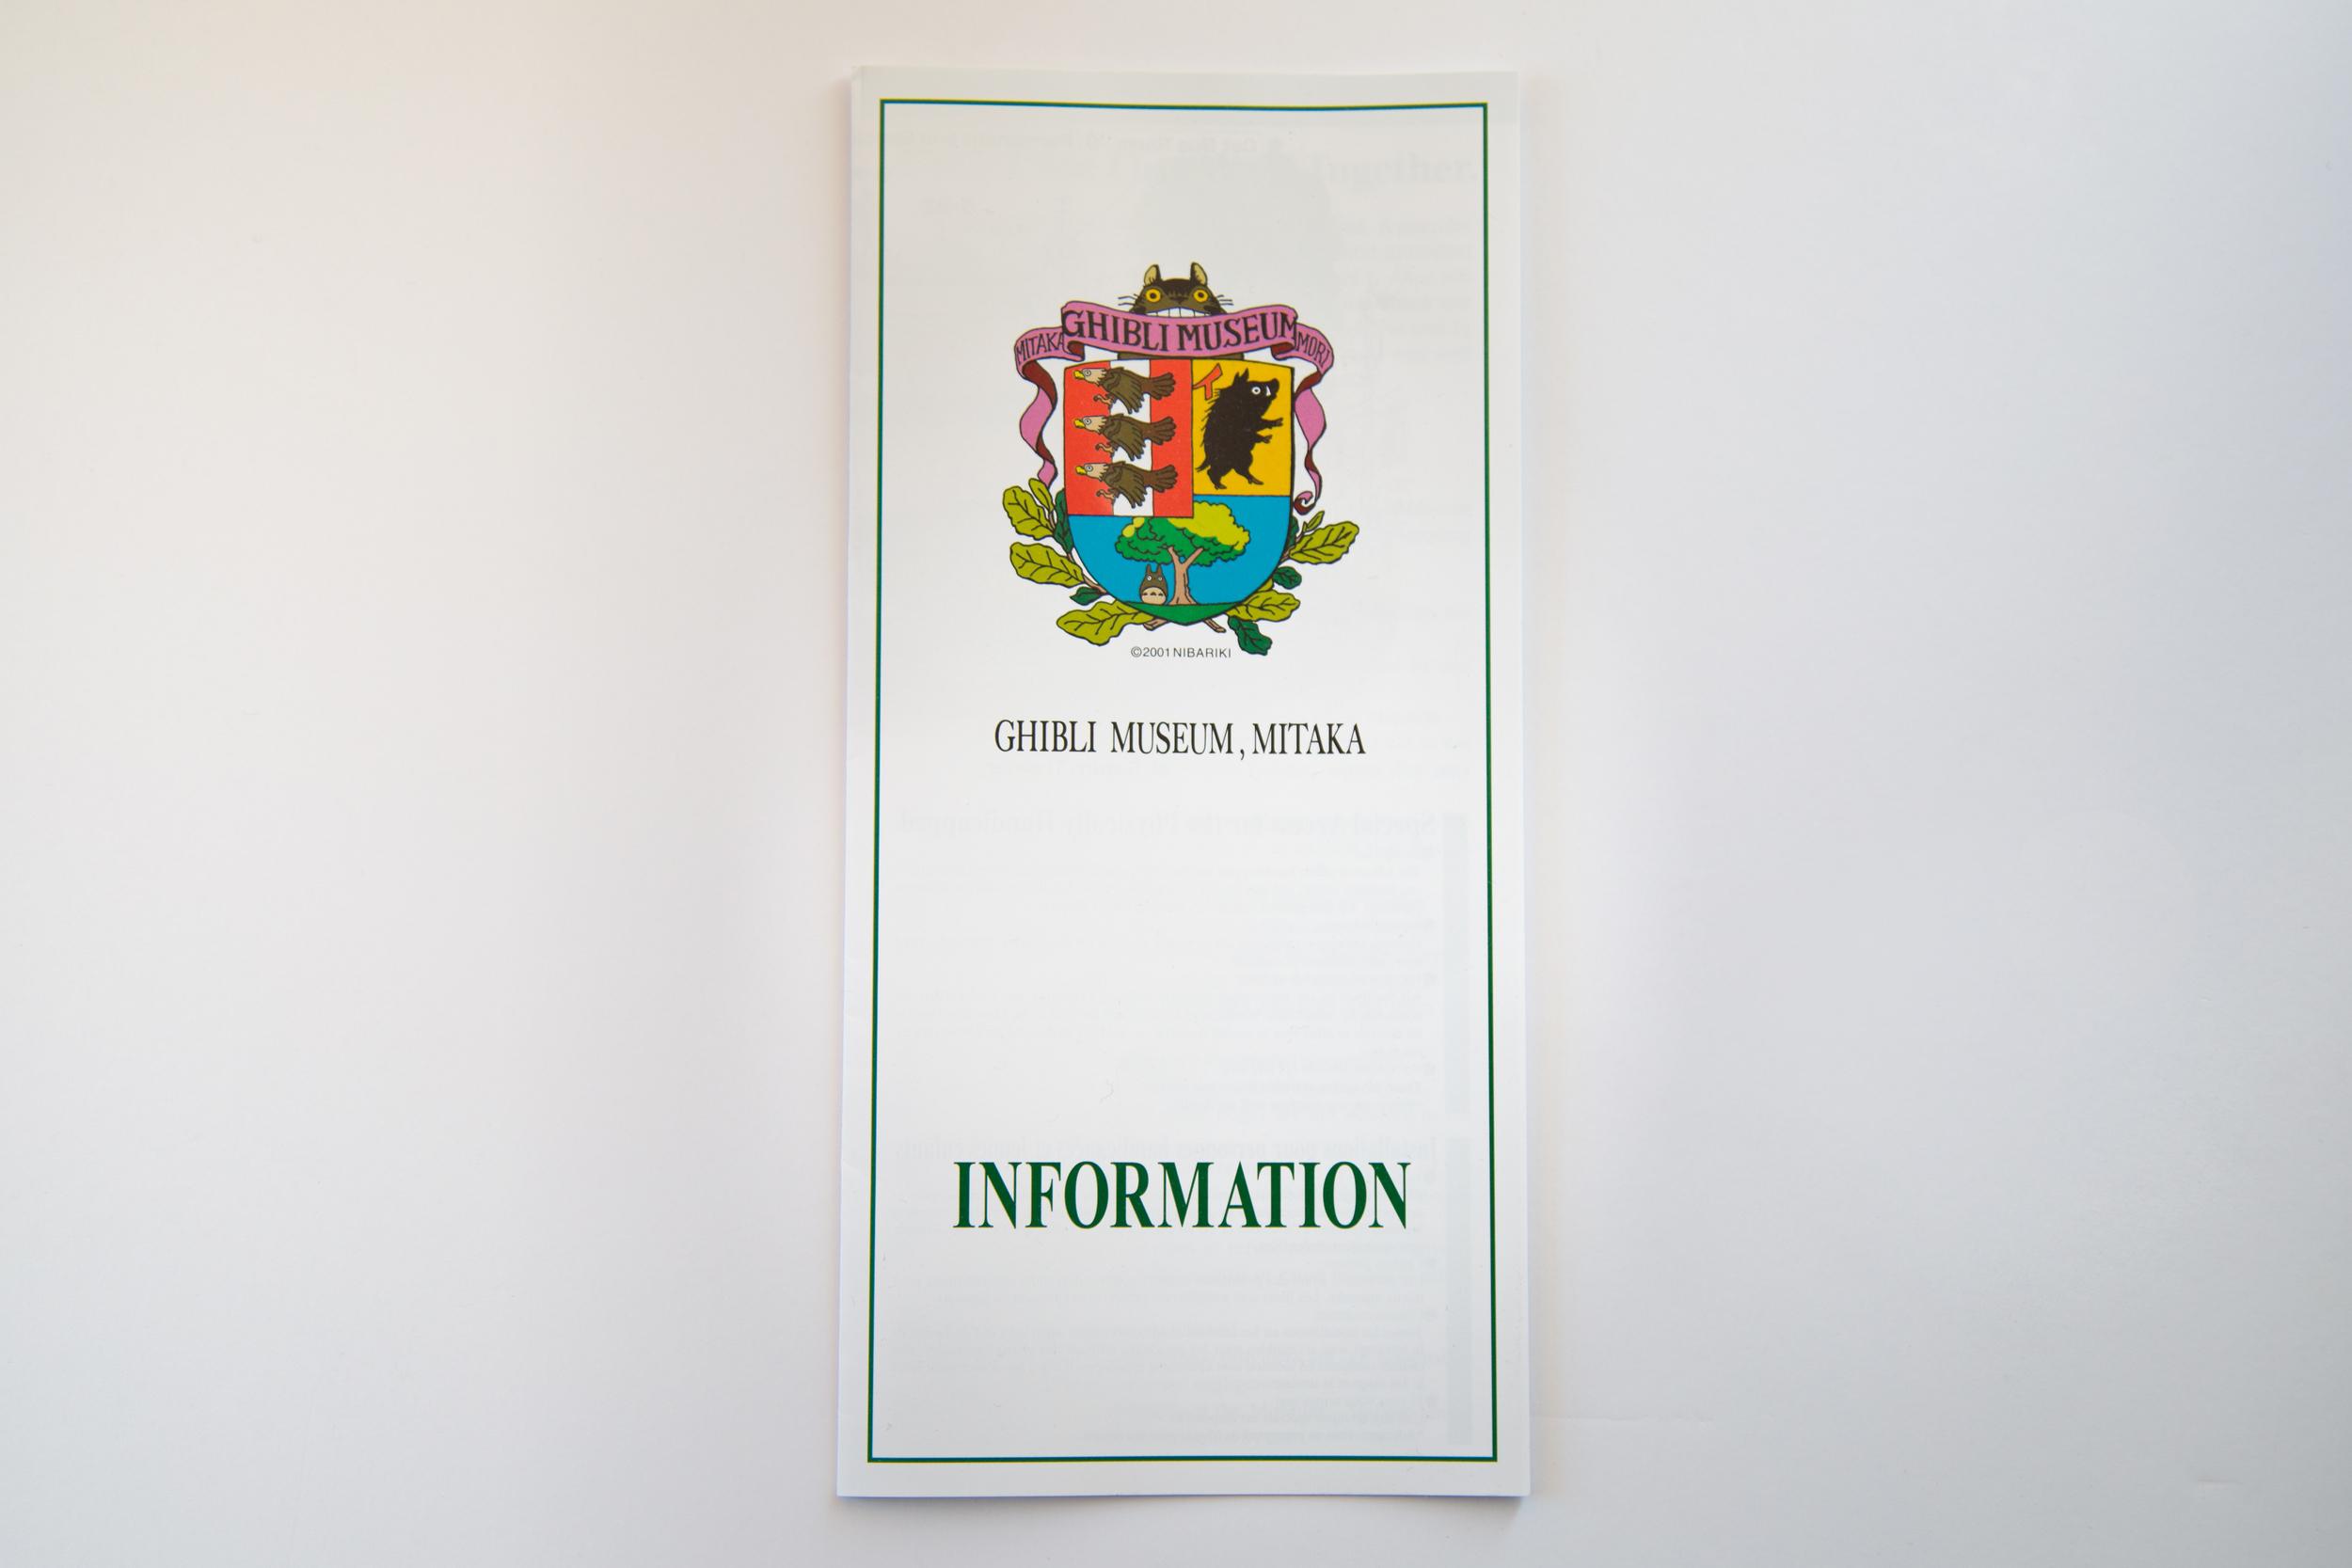 Ghibli Museum Information